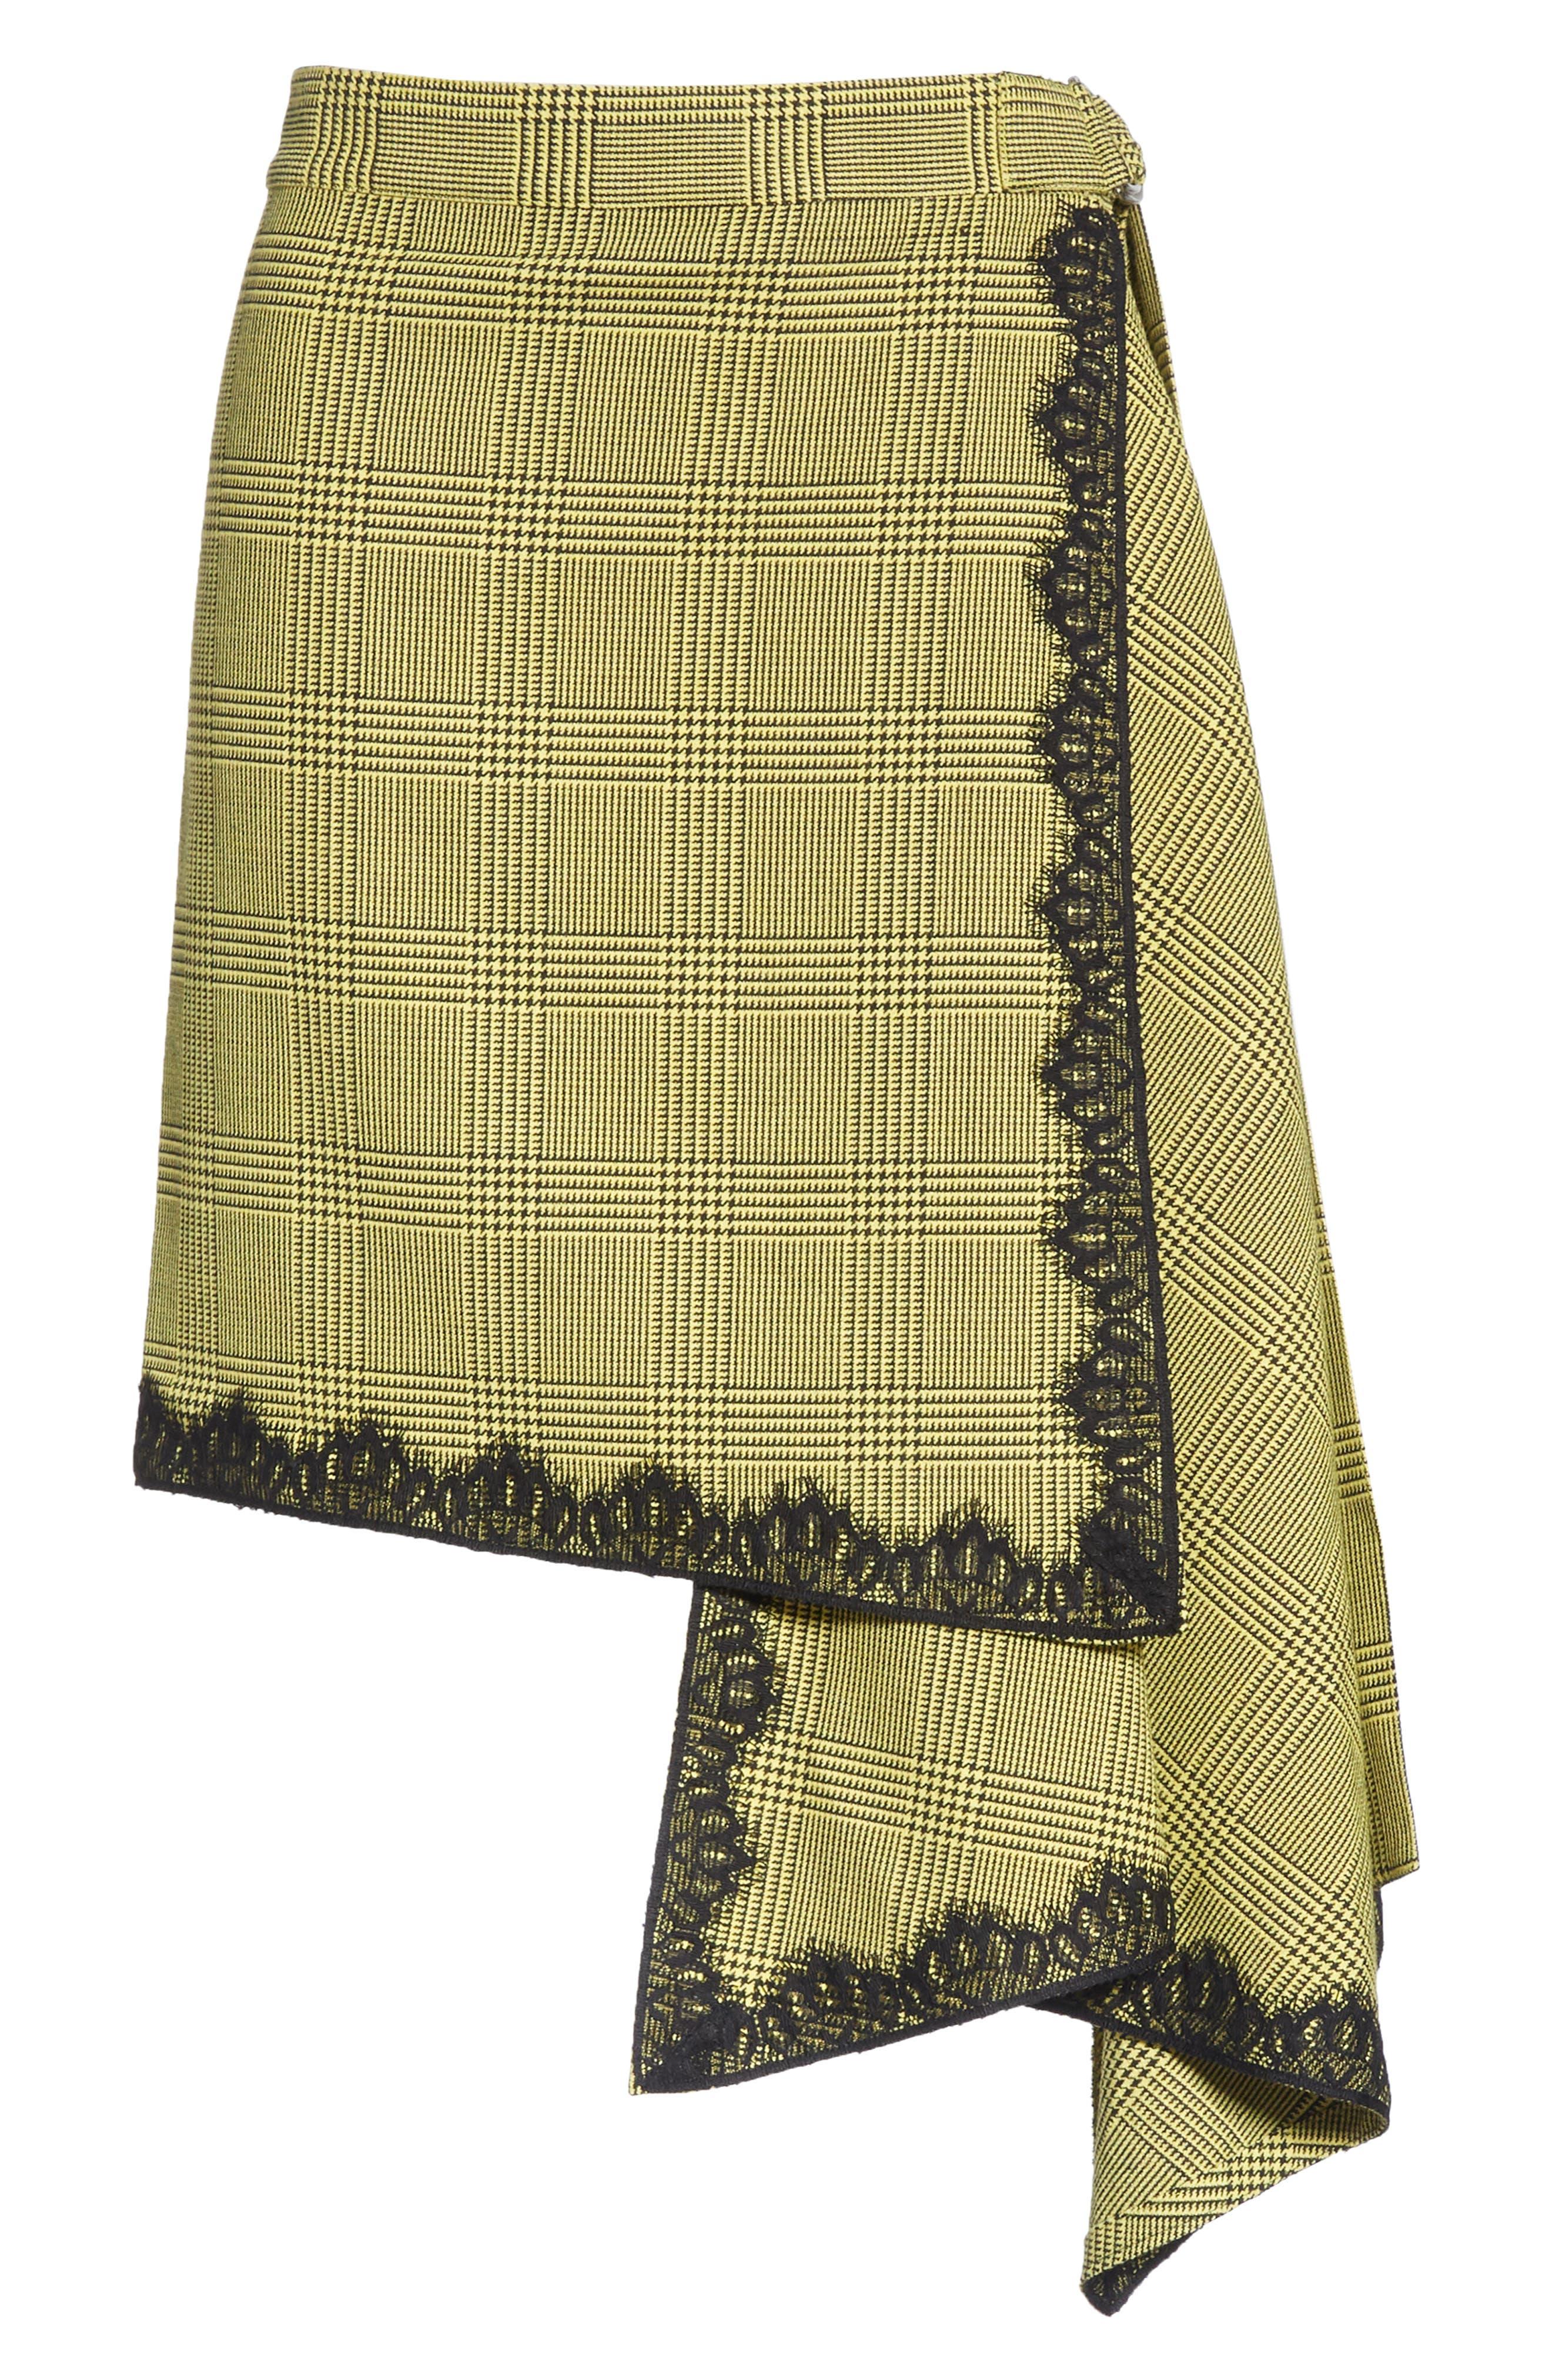 Lace Trim Plaid Skirt,                             Alternate thumbnail 6, color,                             BLACK/ YELLOW